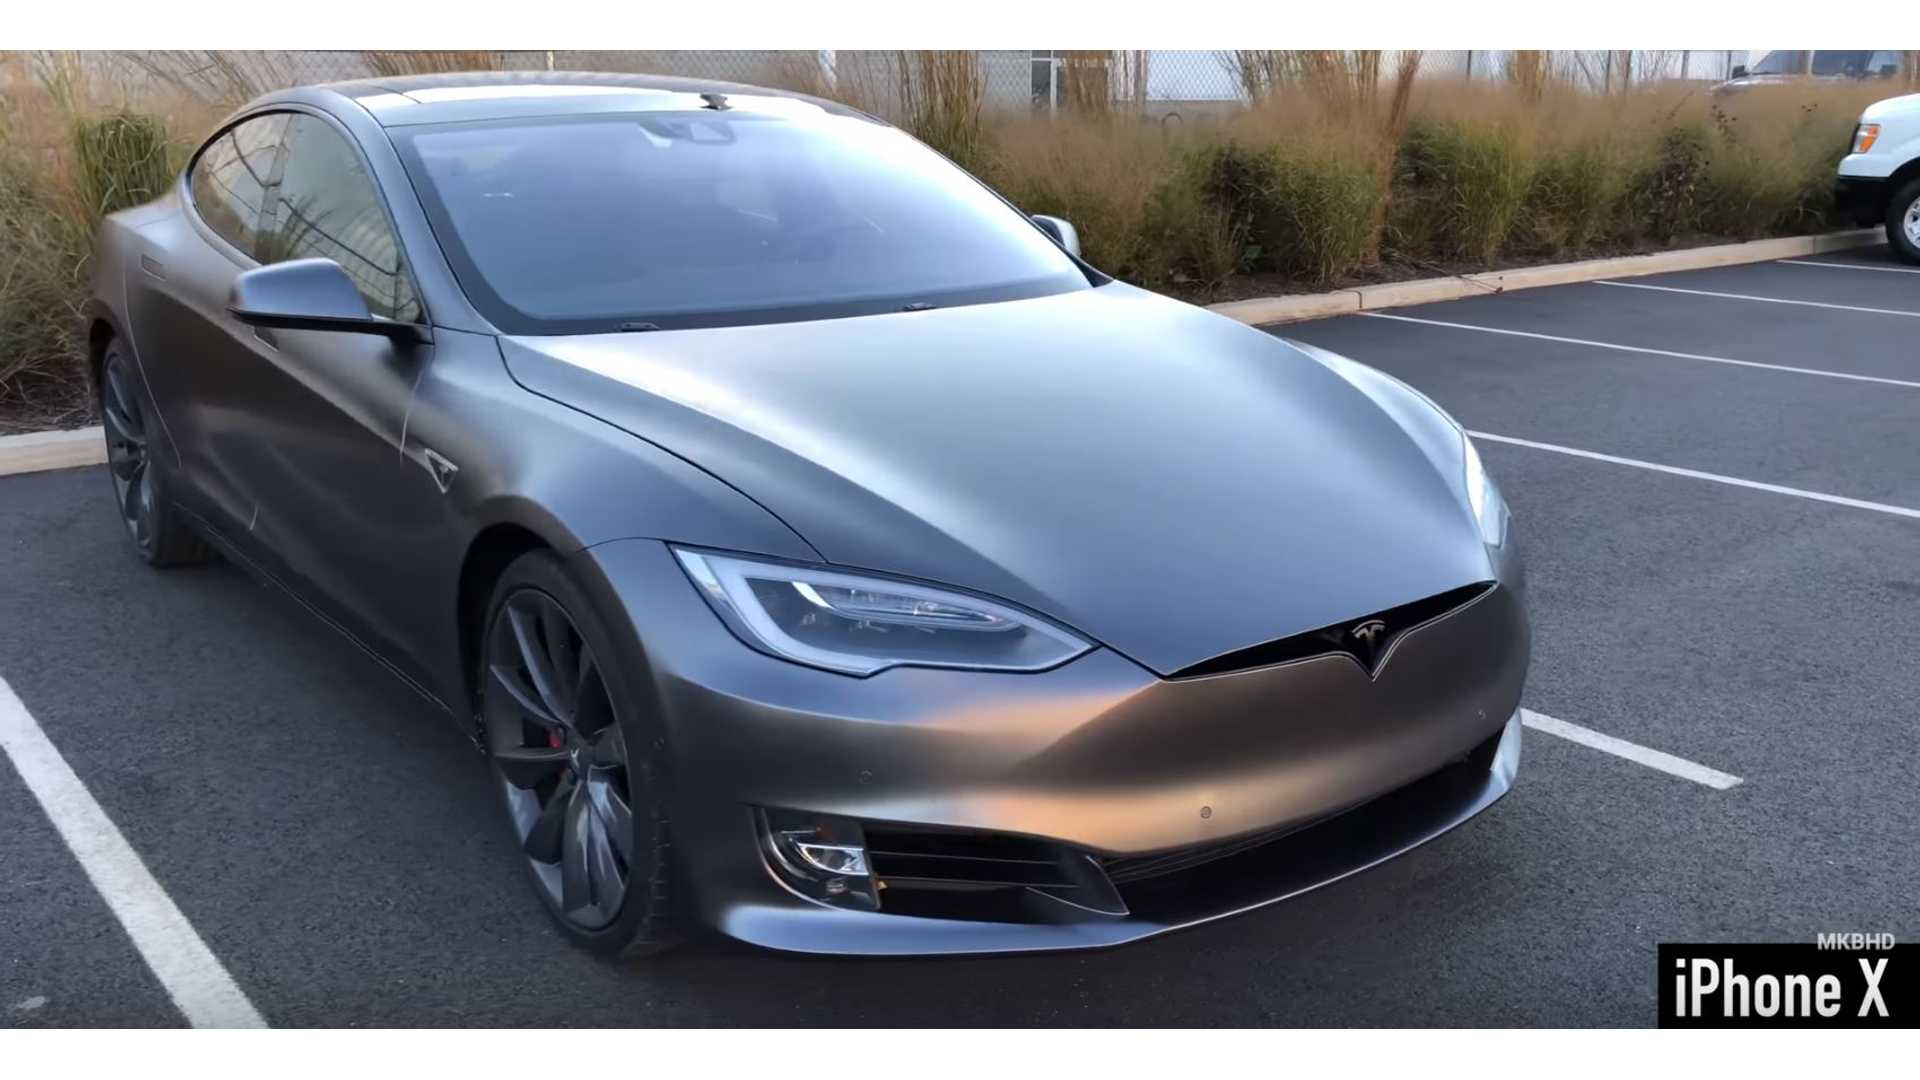 Tesla Model 3 Phone Wallpapers Wallpaper Cave